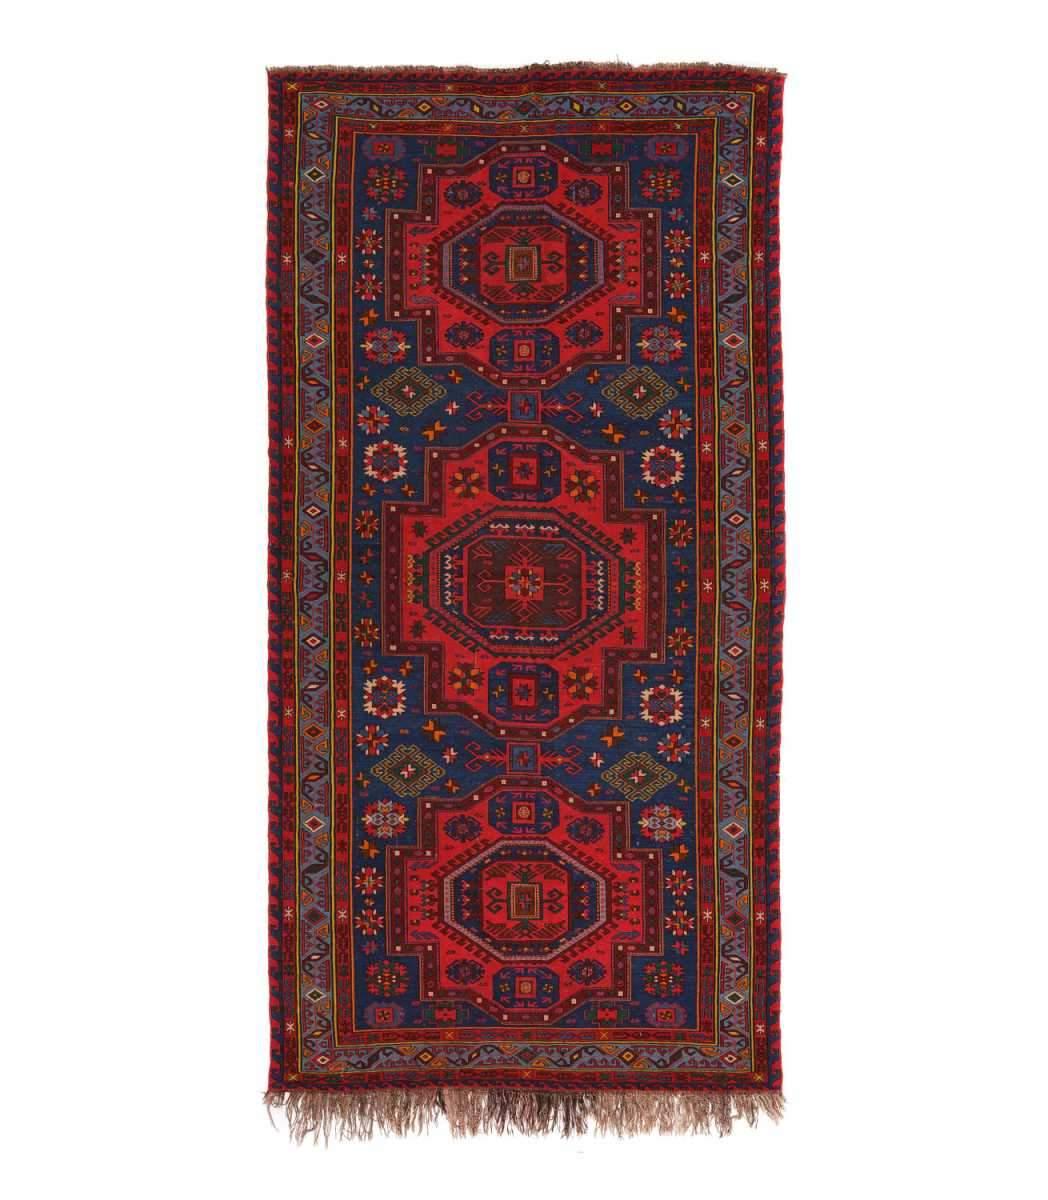 Винтажный Азербайджанский Ковер Orazbai Collection «Сундук»